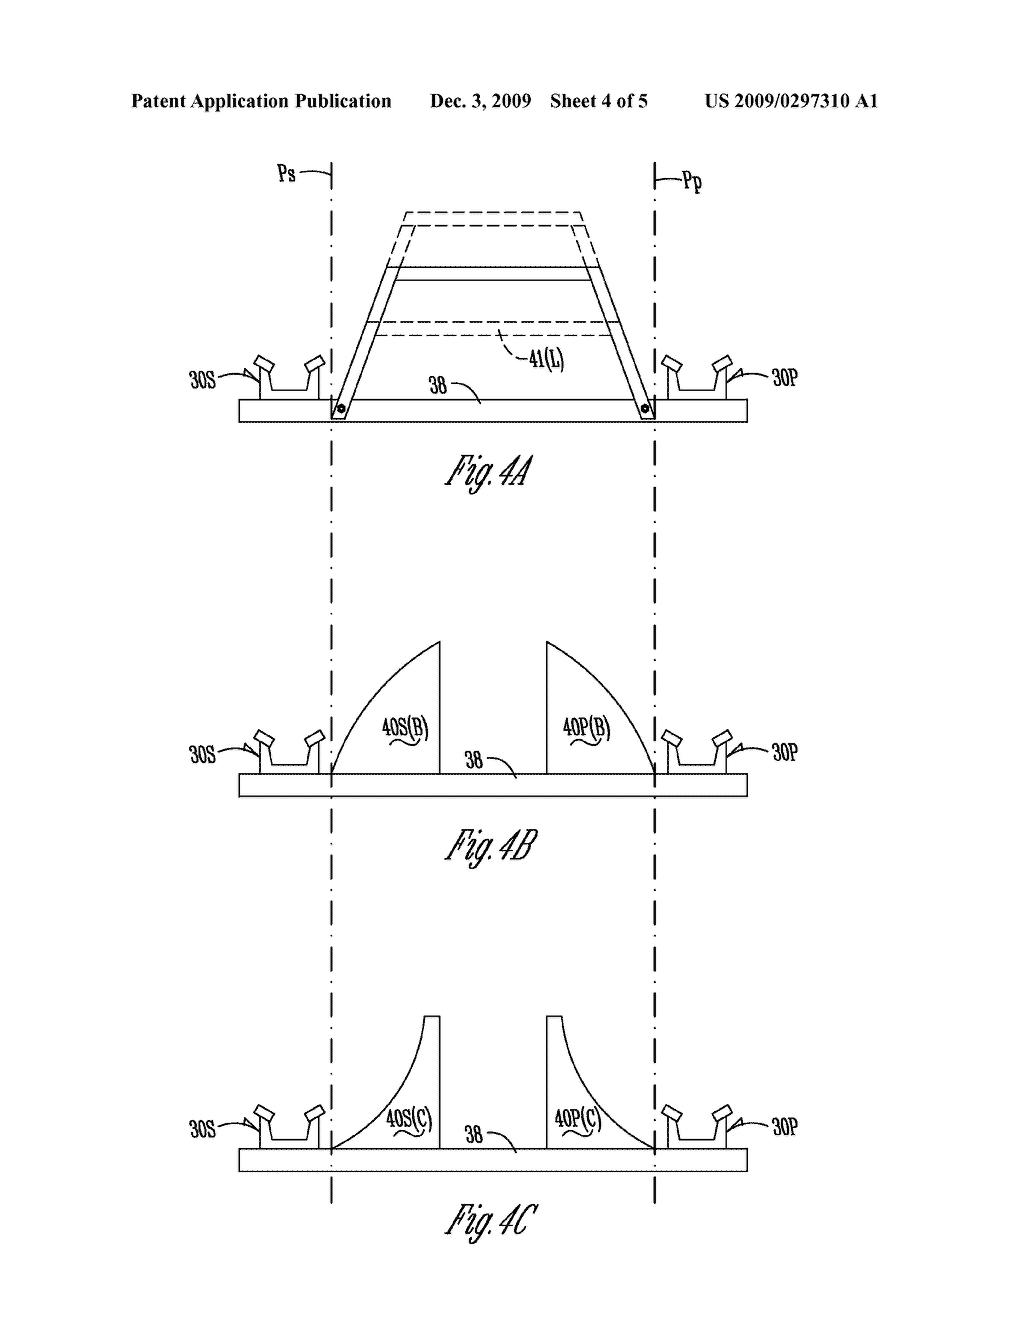 Pontoon Boat Diagram Manual Of Wiring Sylvan Trailer Guide Schematic And Image 05 Rh Patentsencyclopedia Com